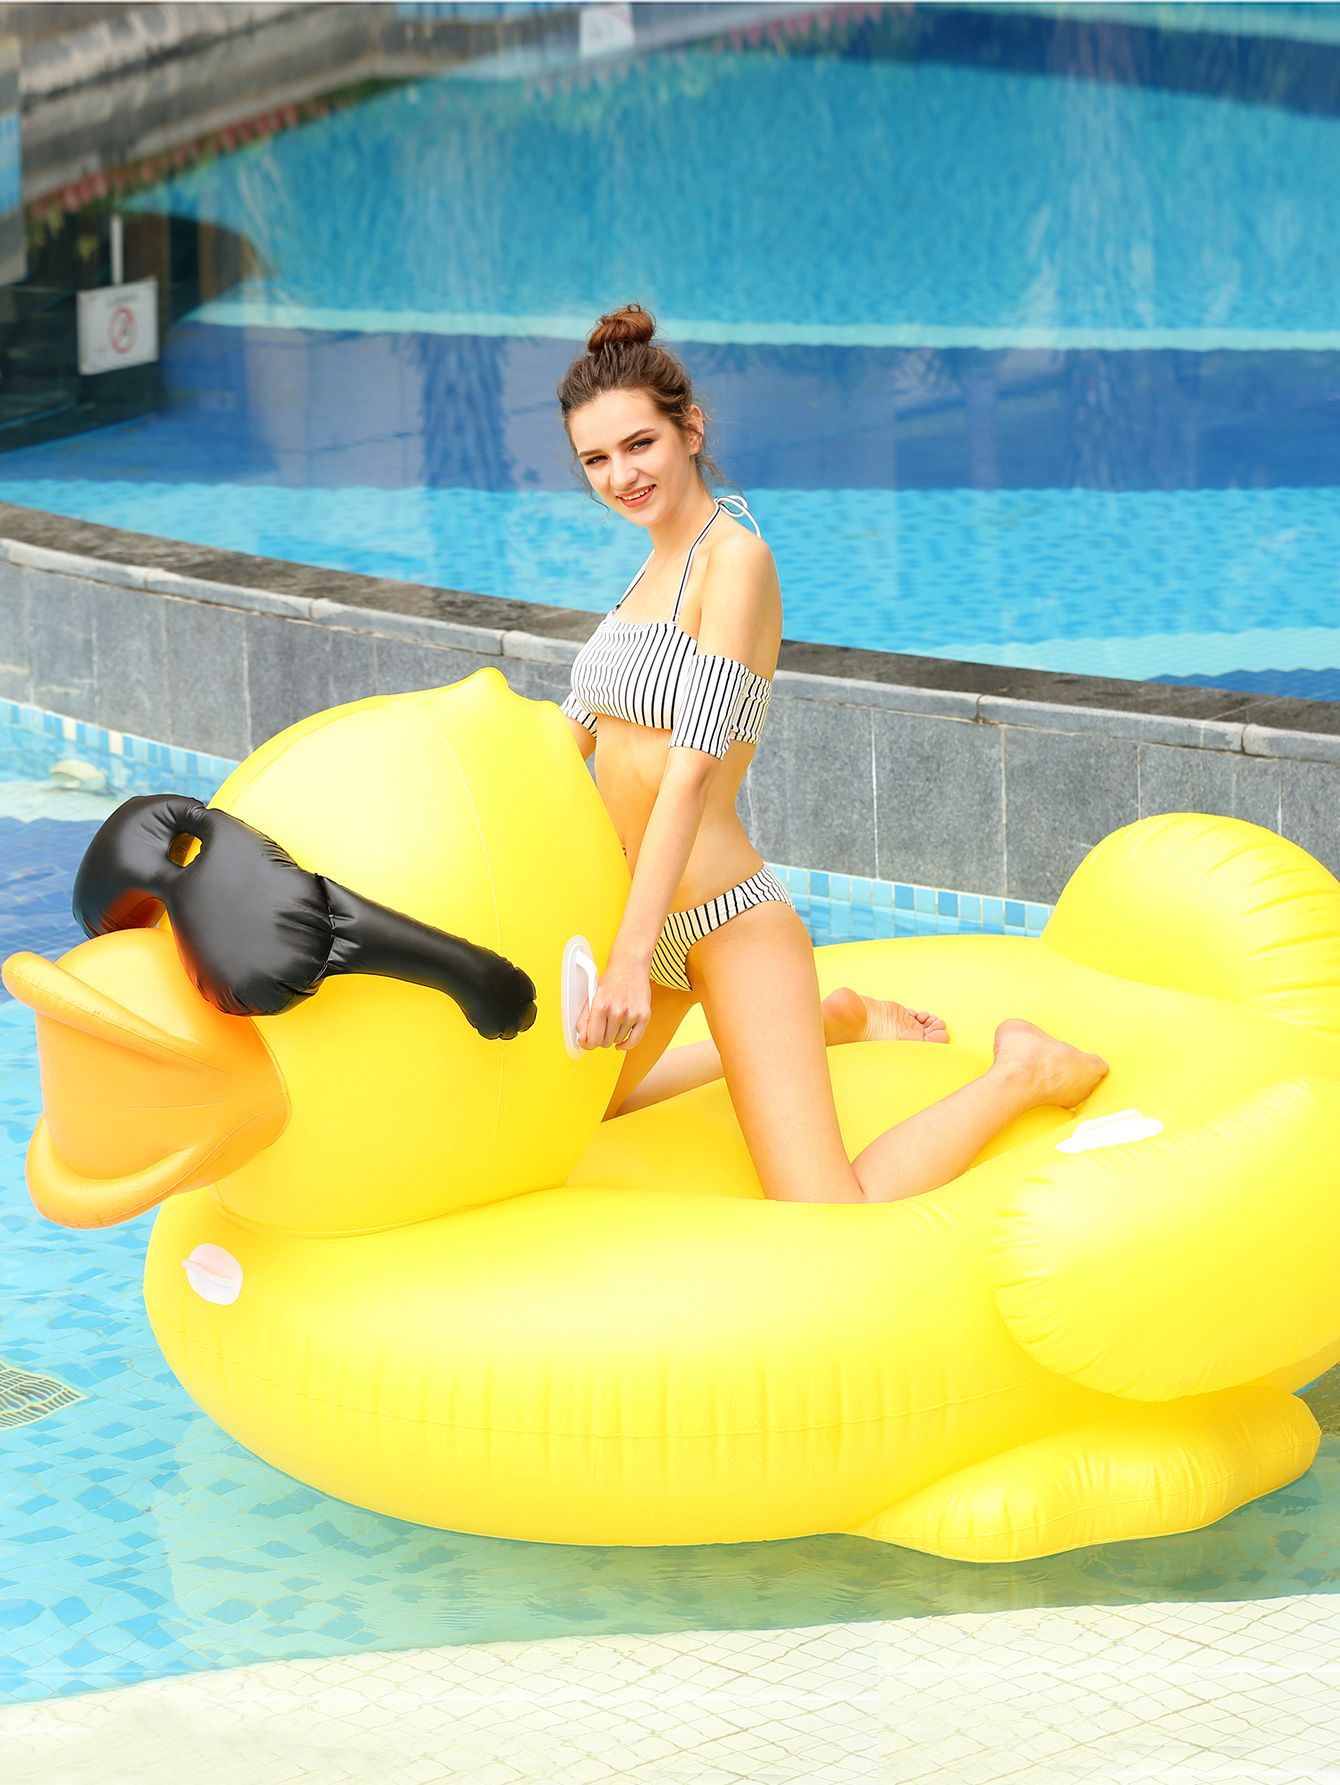 Shop Giant Duck Pool Float Online Shein Offers Giant Duck Pool Float More To Fit Your Fashionable Needs Pool Floaties Cute Pool Floats Summer Pool Floats